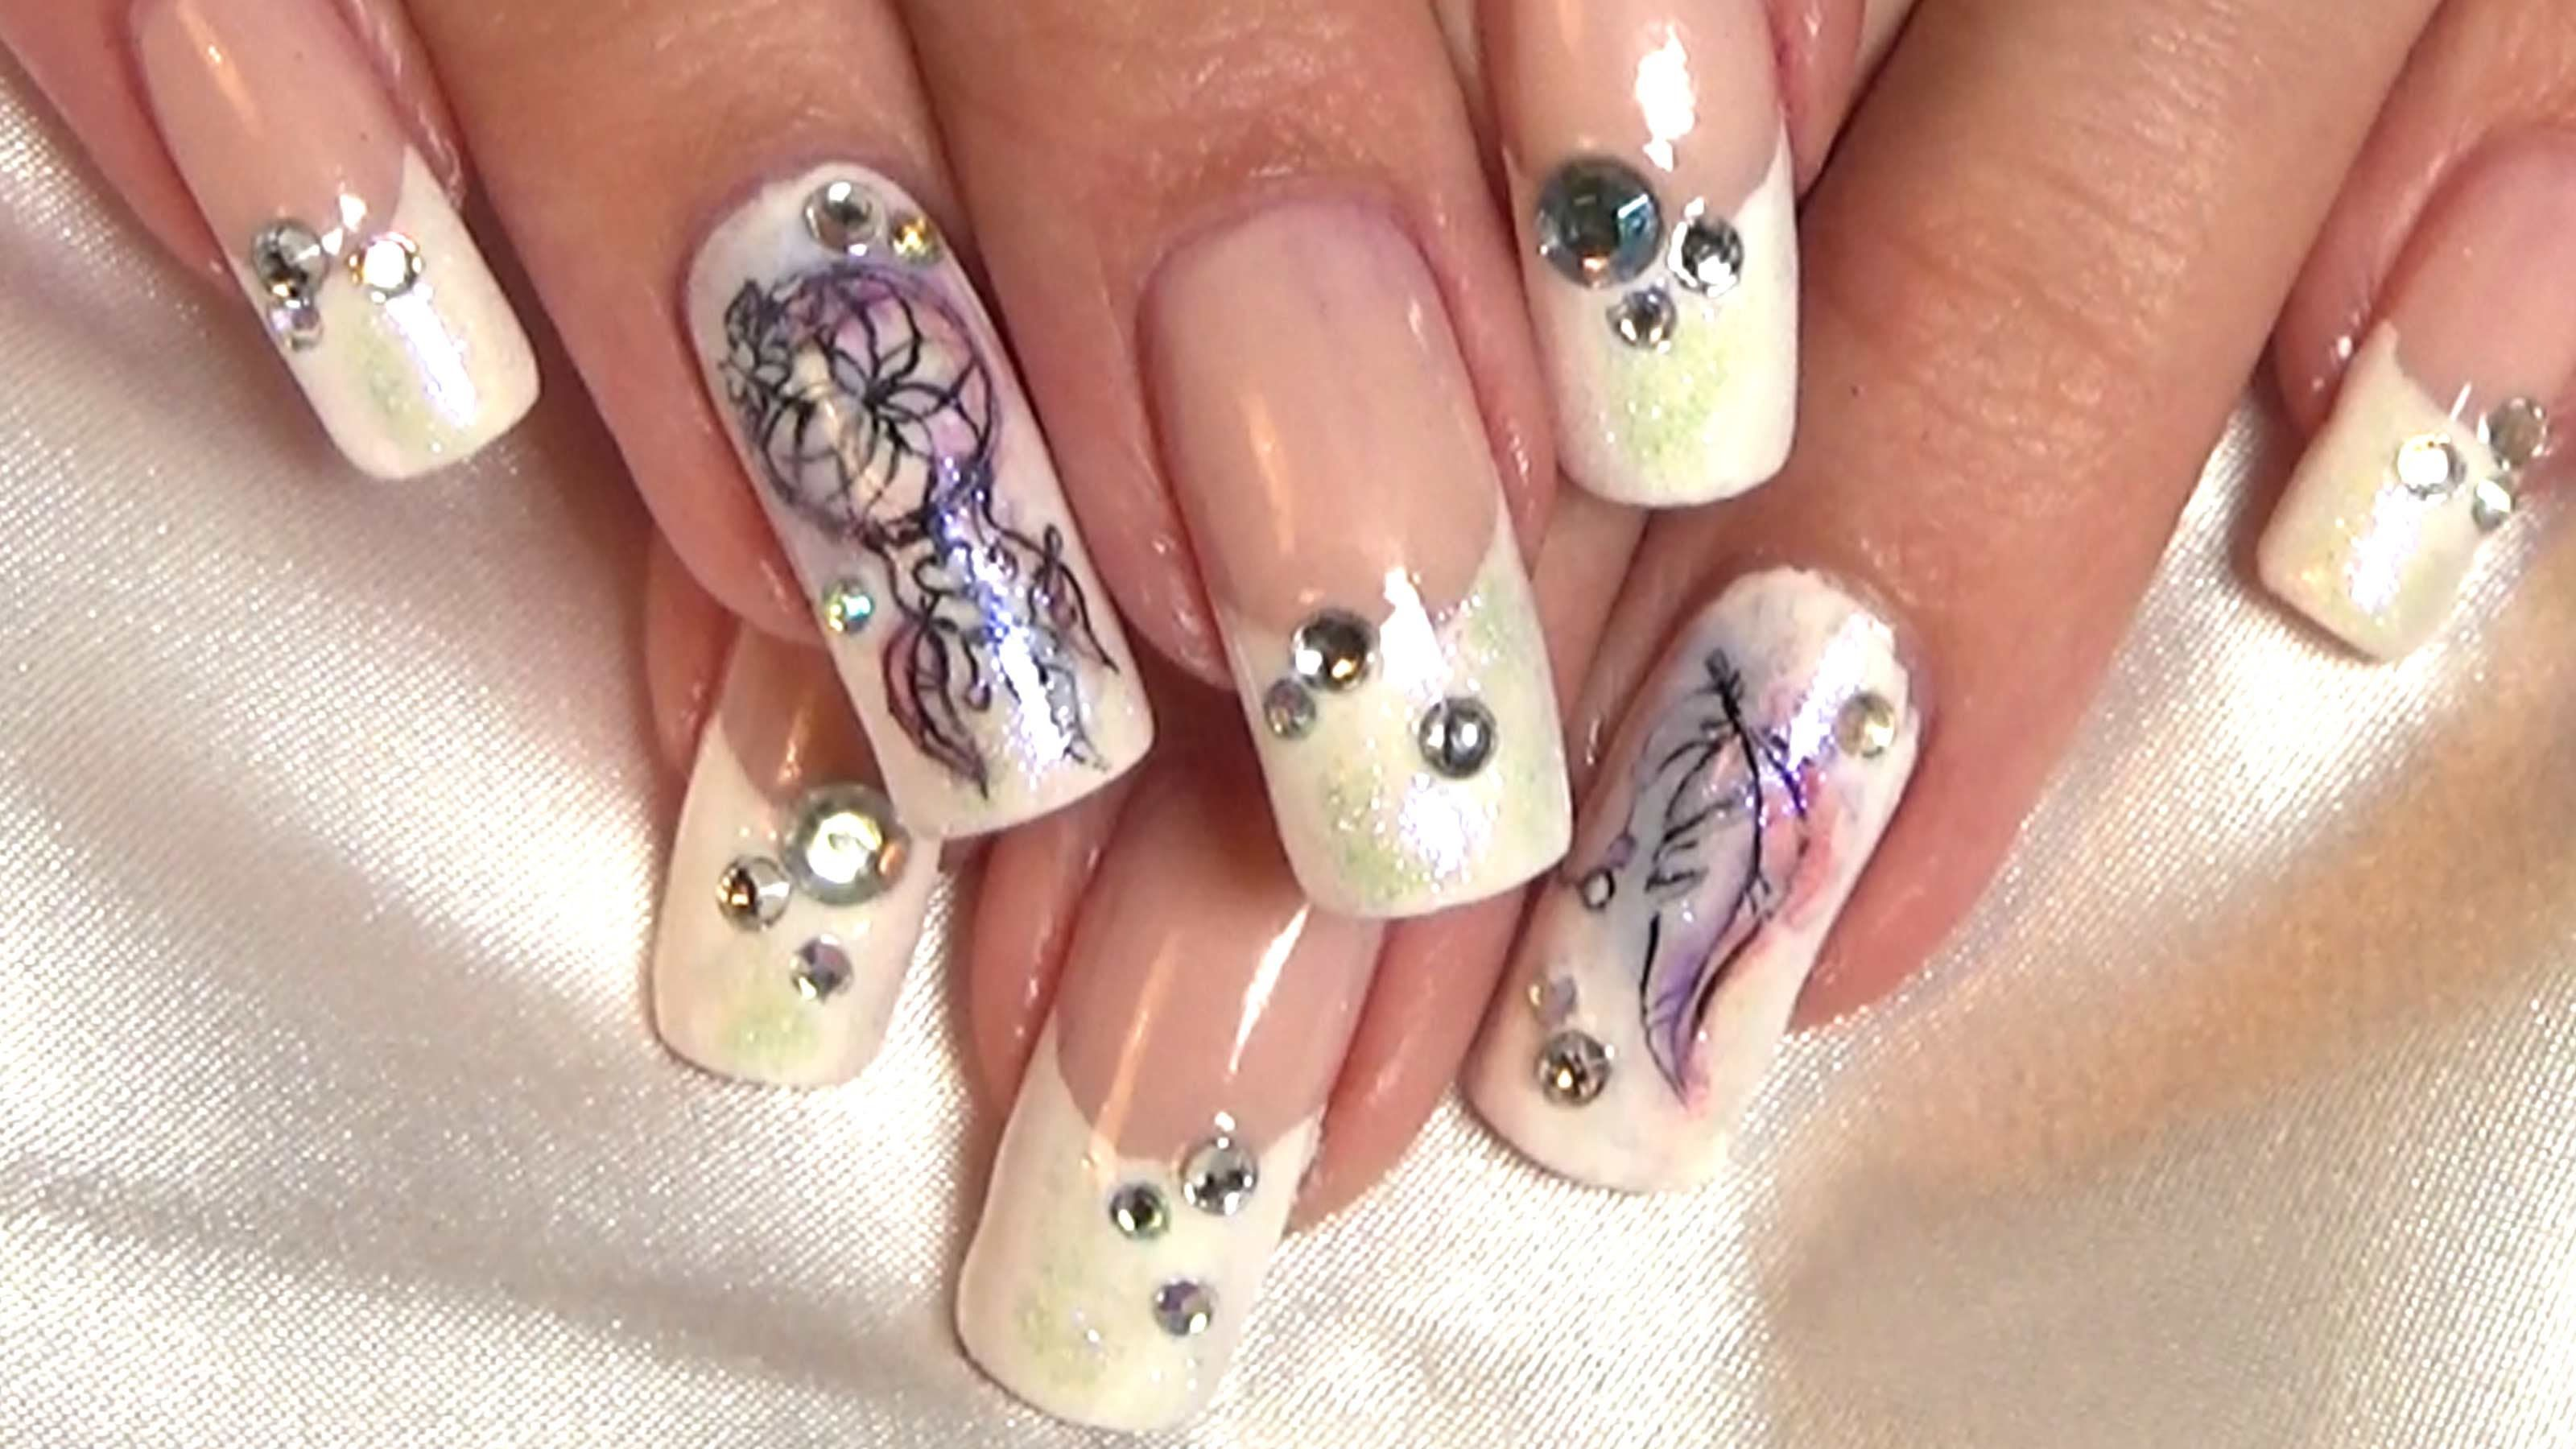 Dream Catcher French Manicure Nail Art Tutorial   Nail Art   Pinterest